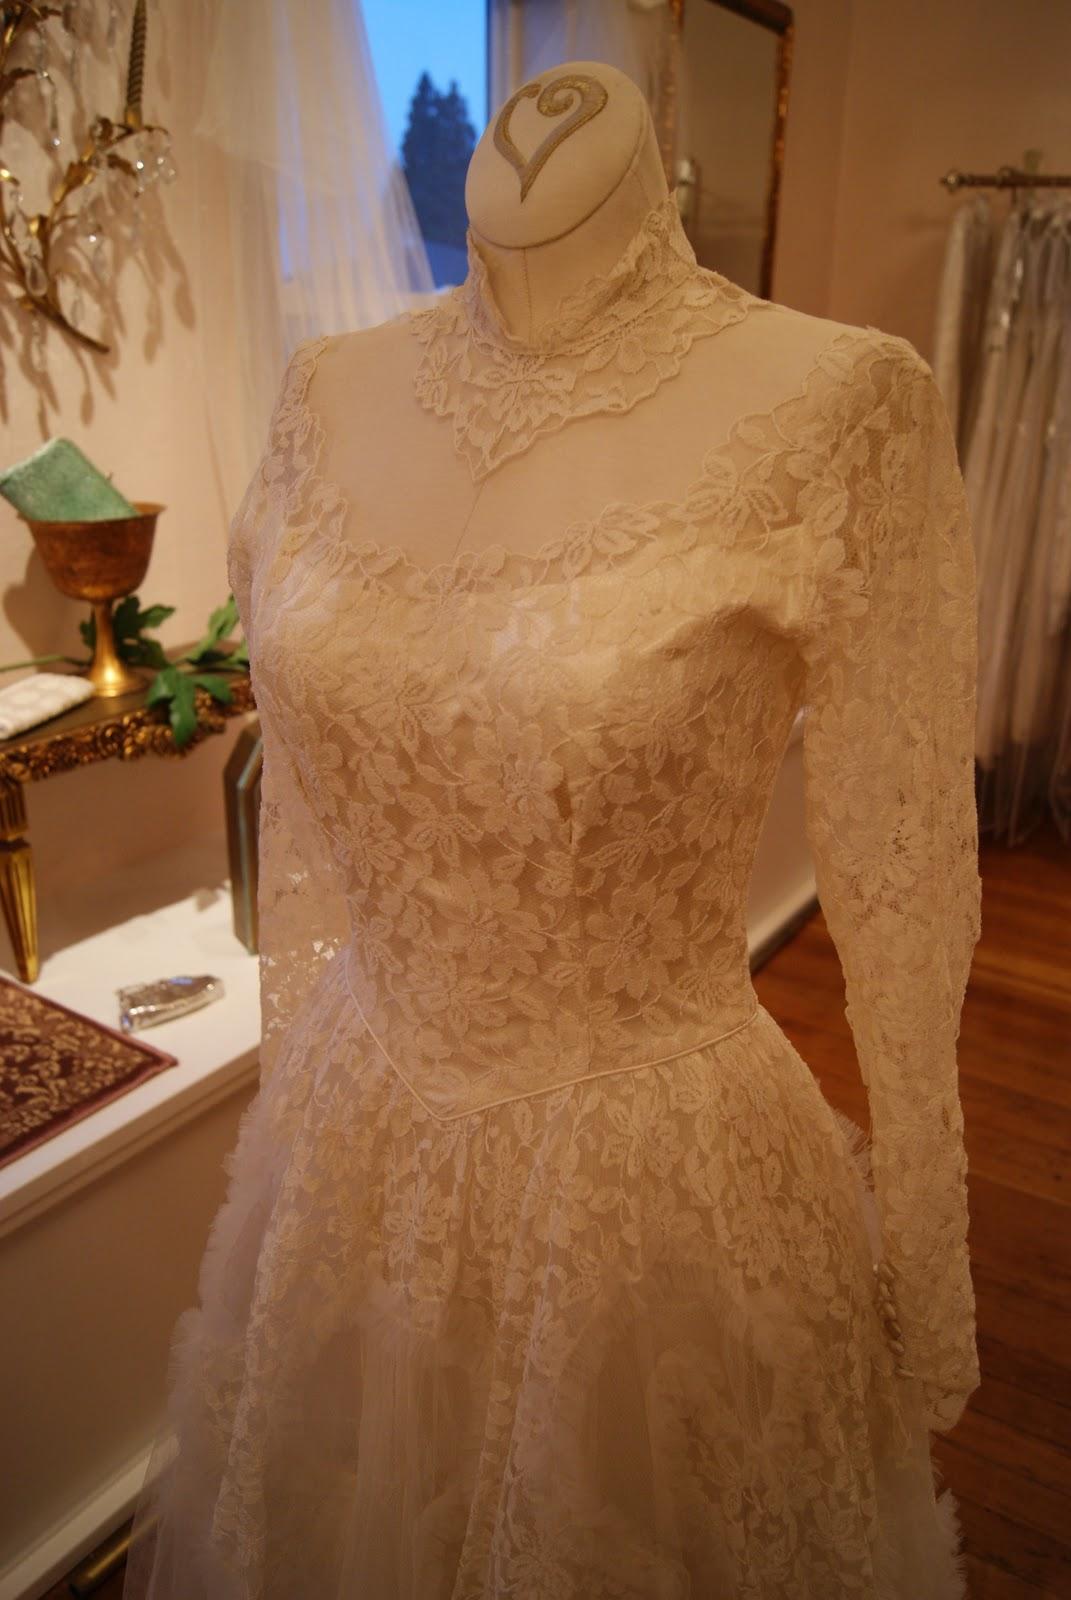 Wedding salon: how to open